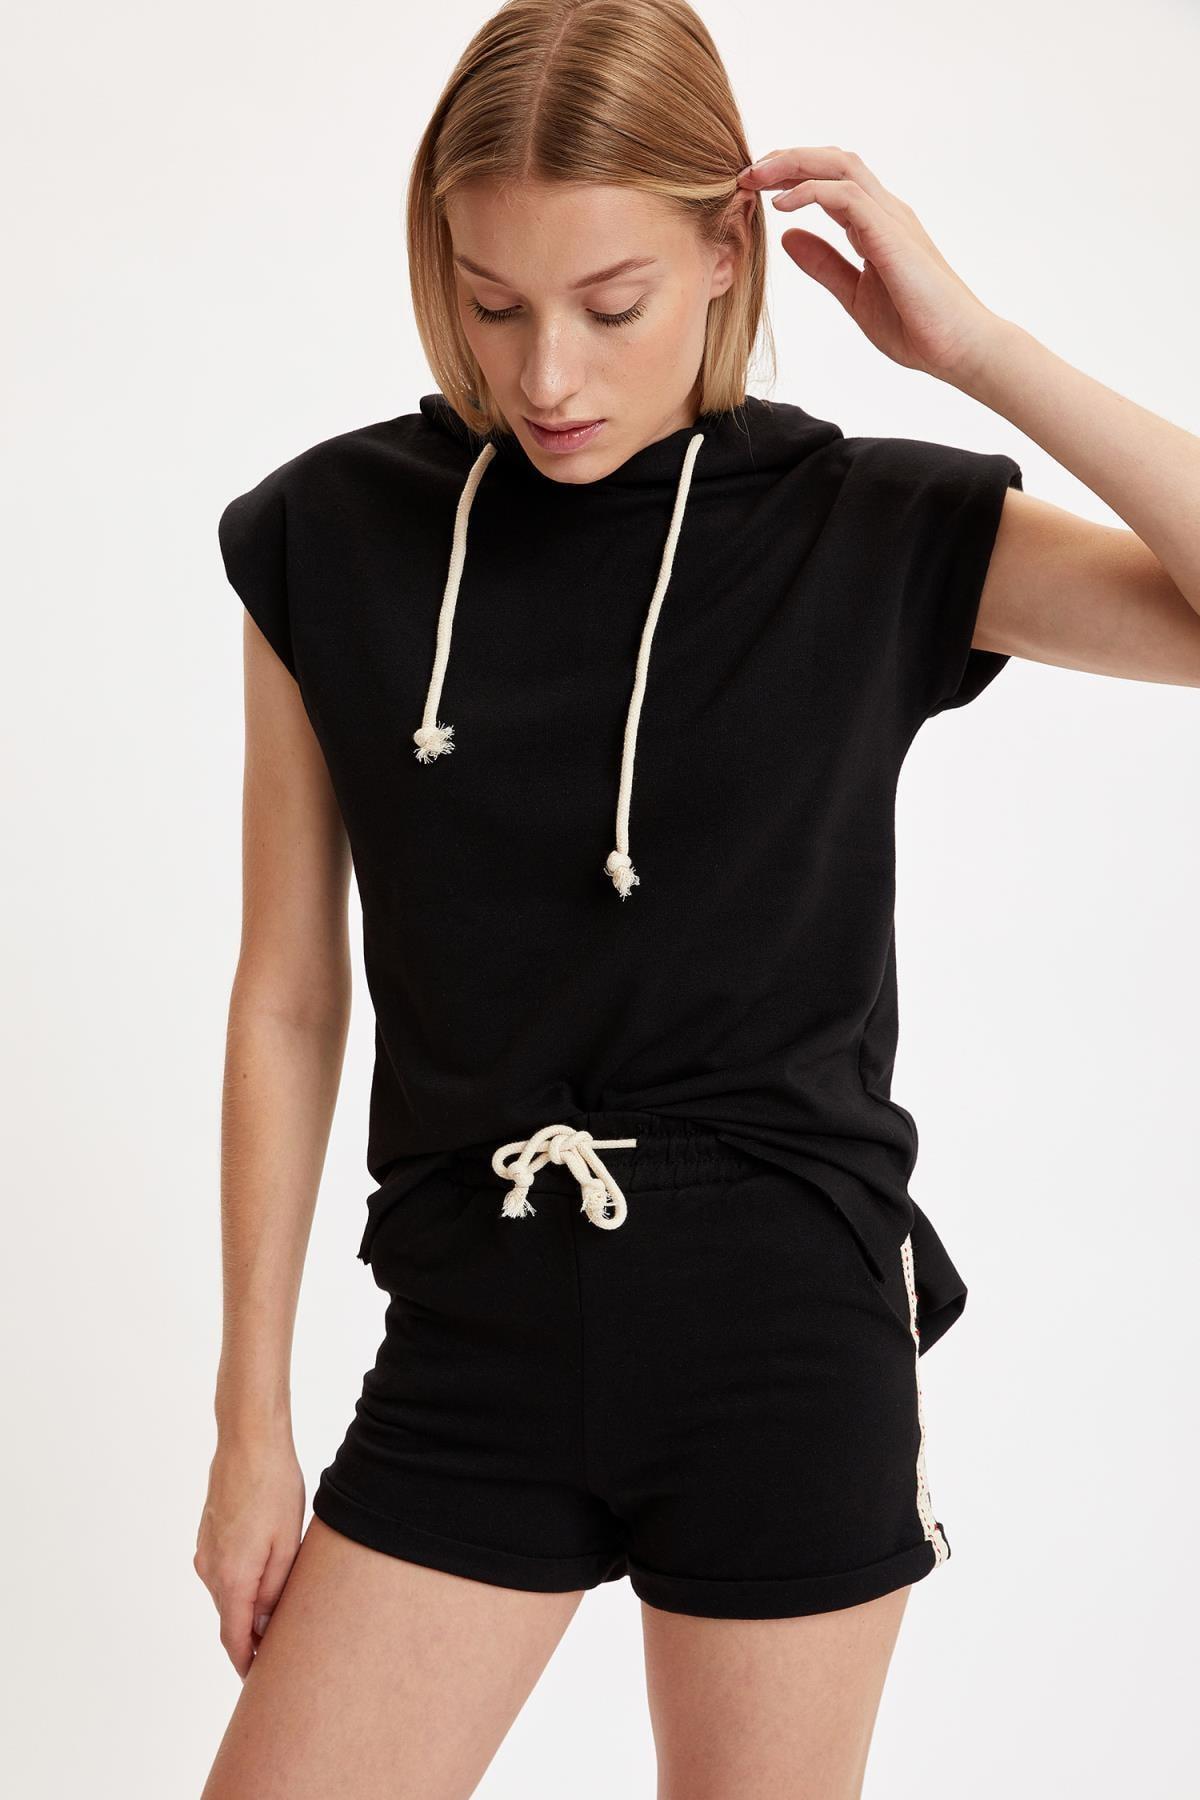 DeFacto Kadın Black Red Relax Fit Örme Kolsuz Tişört Ve Mini Şort Takım S8973AZ20HS